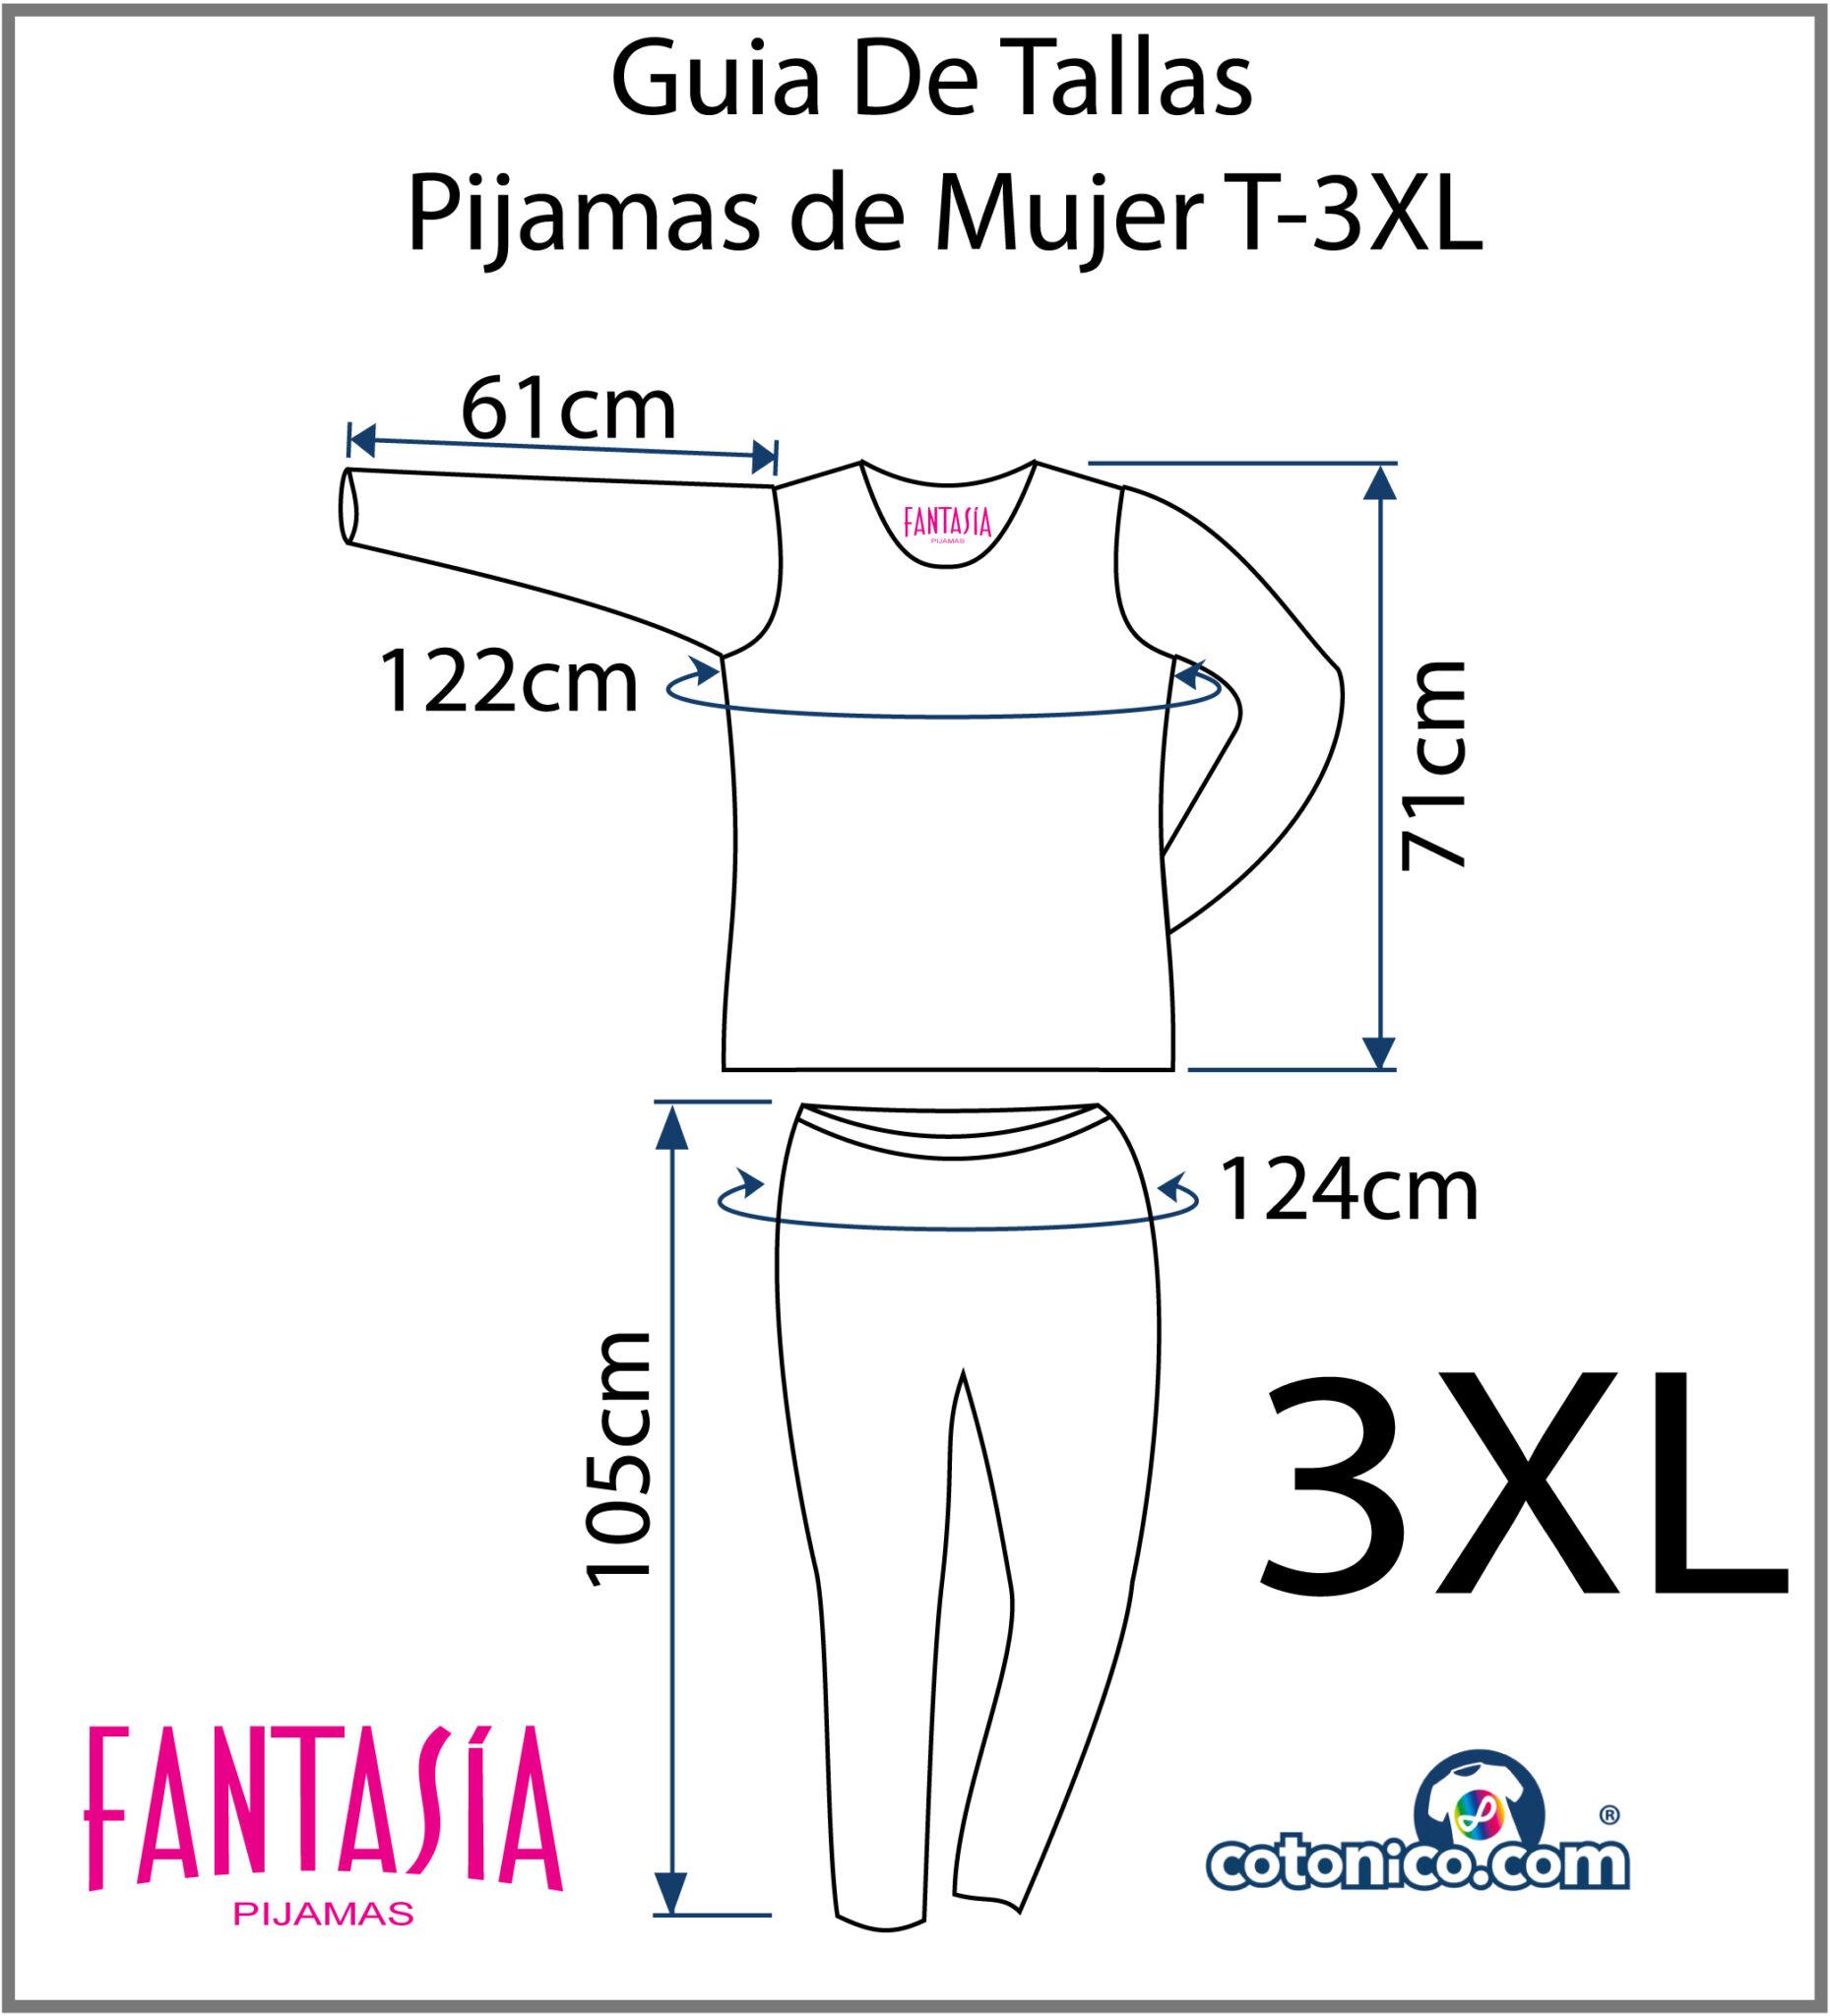 Guia-De-Tallas-Pijamas-De-Mujer-3XL